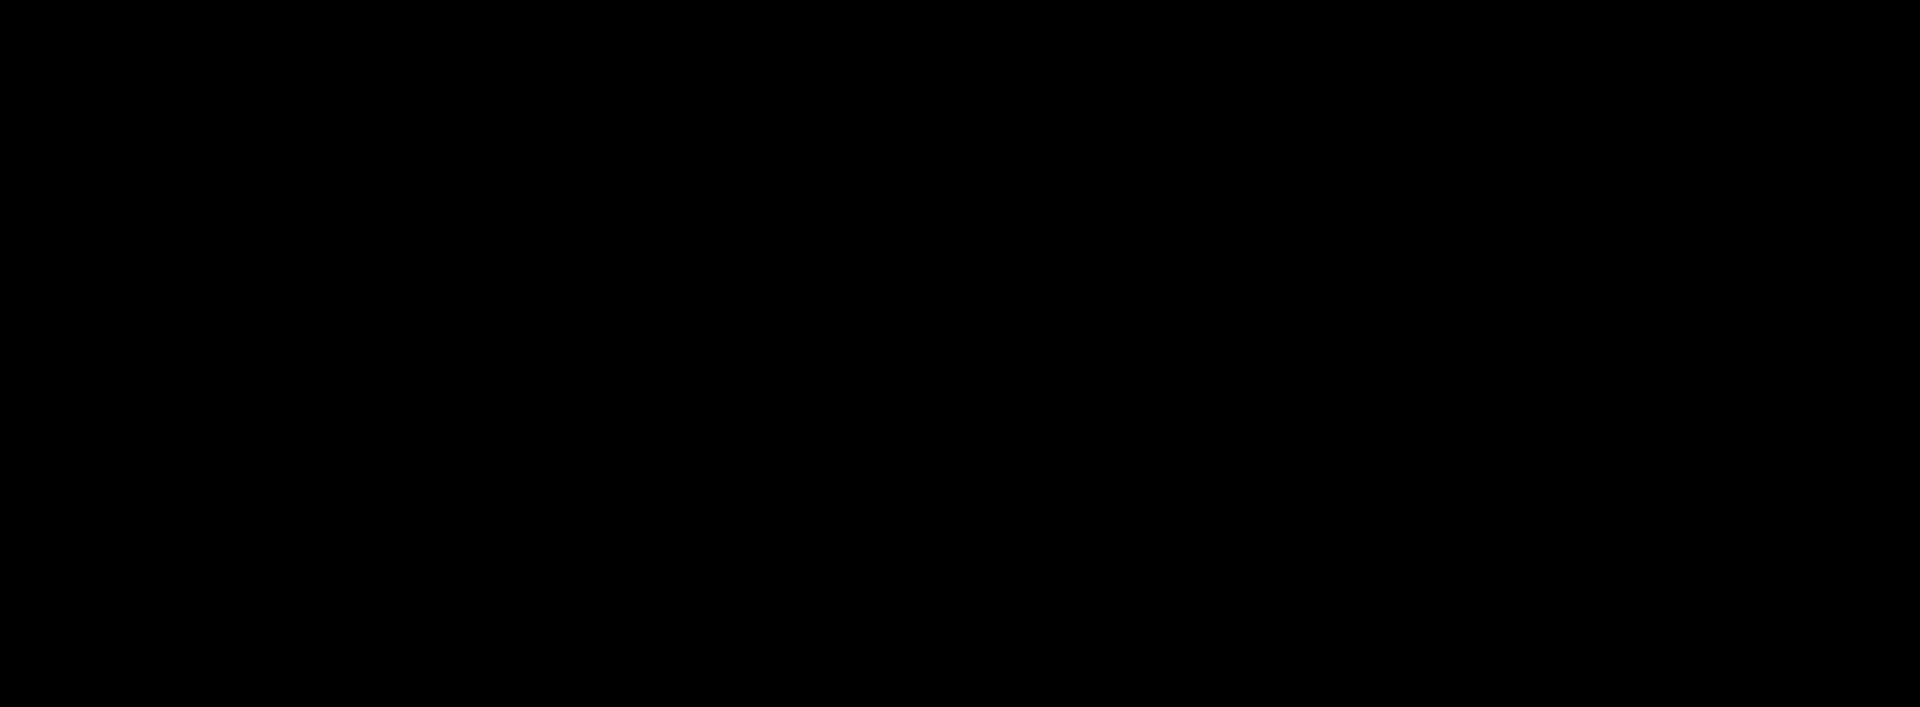 Aldol Condensation vs Cannizzaro Reaction